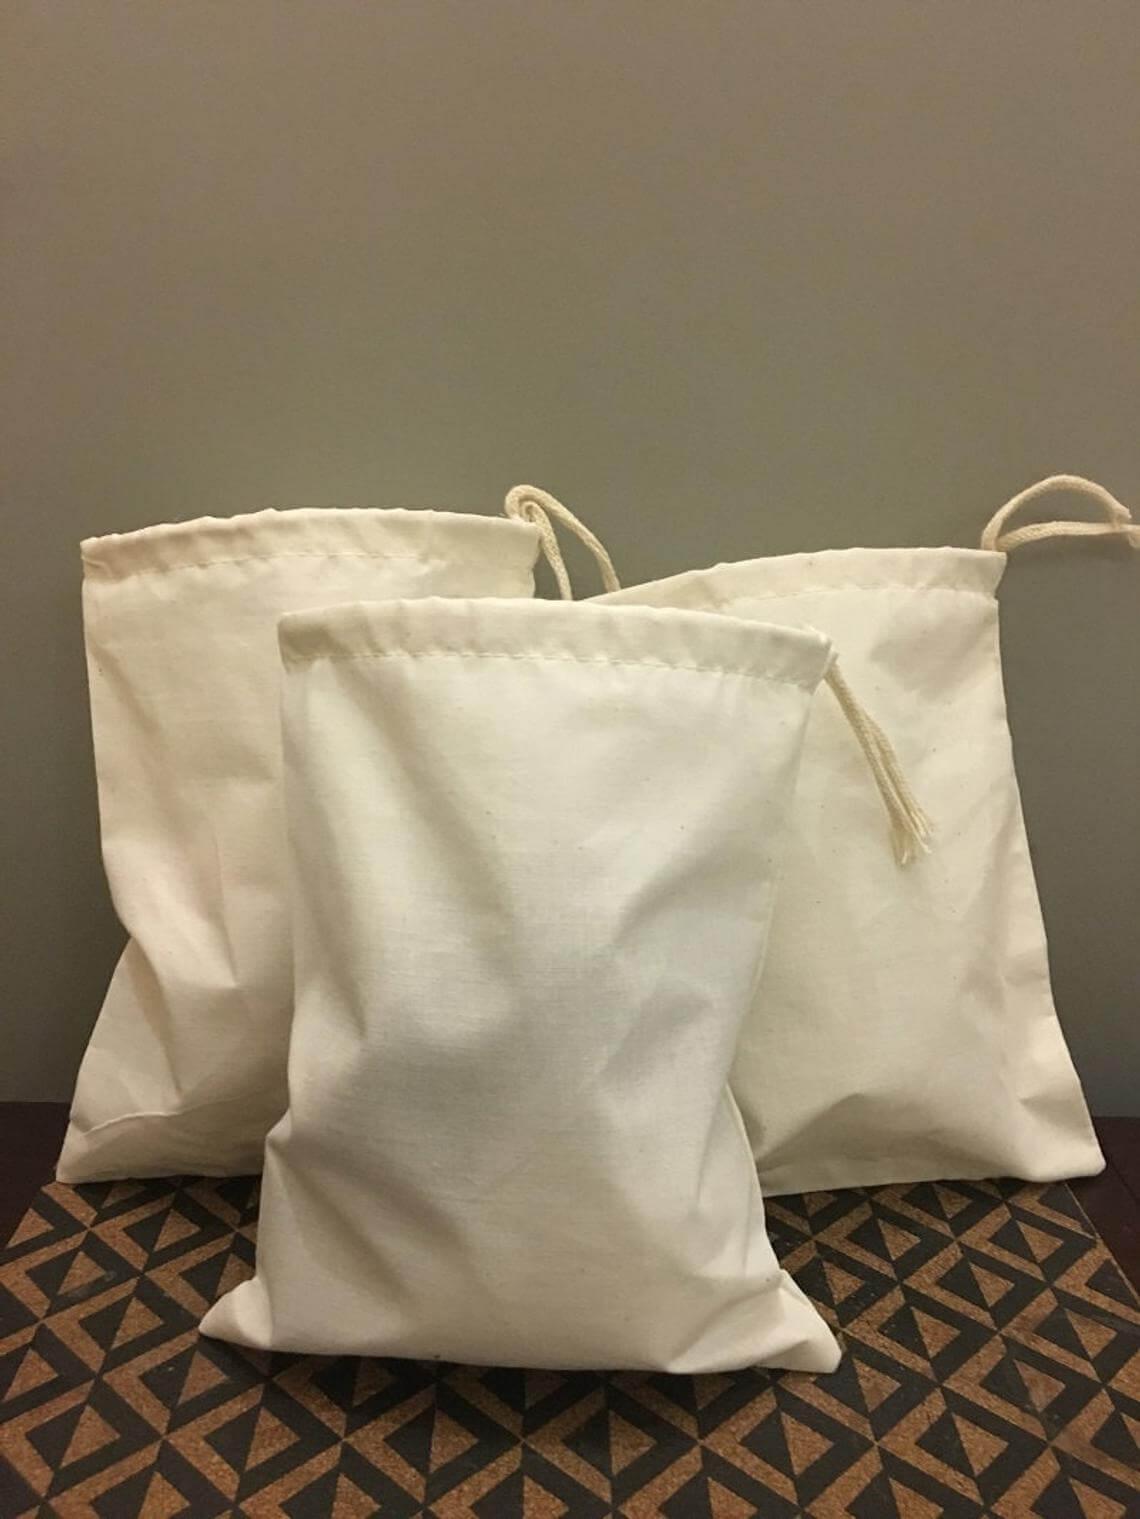 Reusable Cotton Drawstring Travel Bag